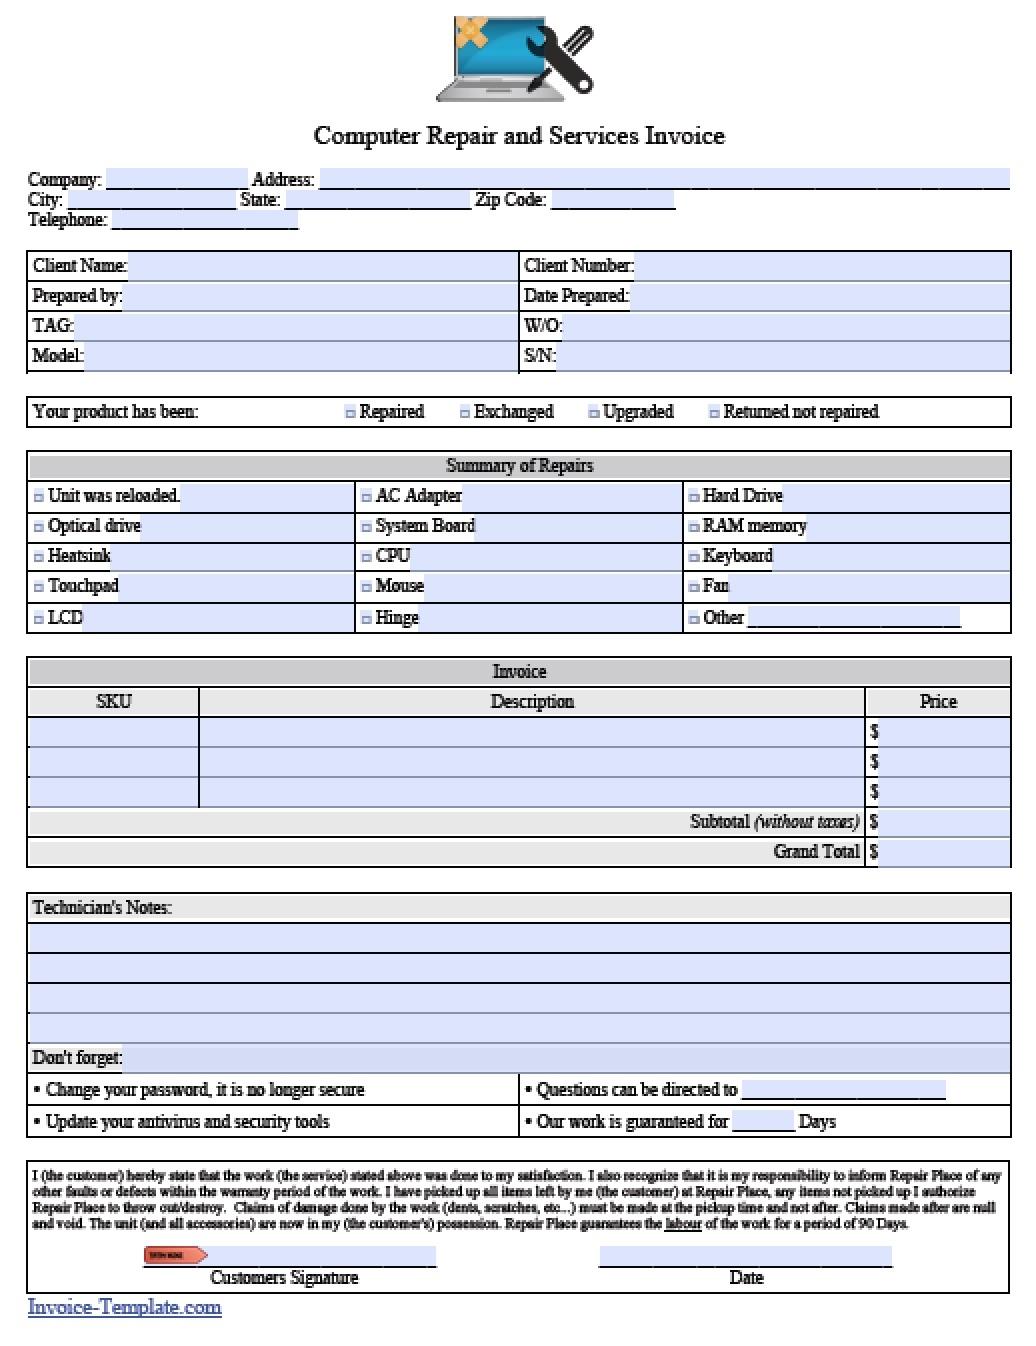 free computer repair service invoice template excel pdf word computer invoice template